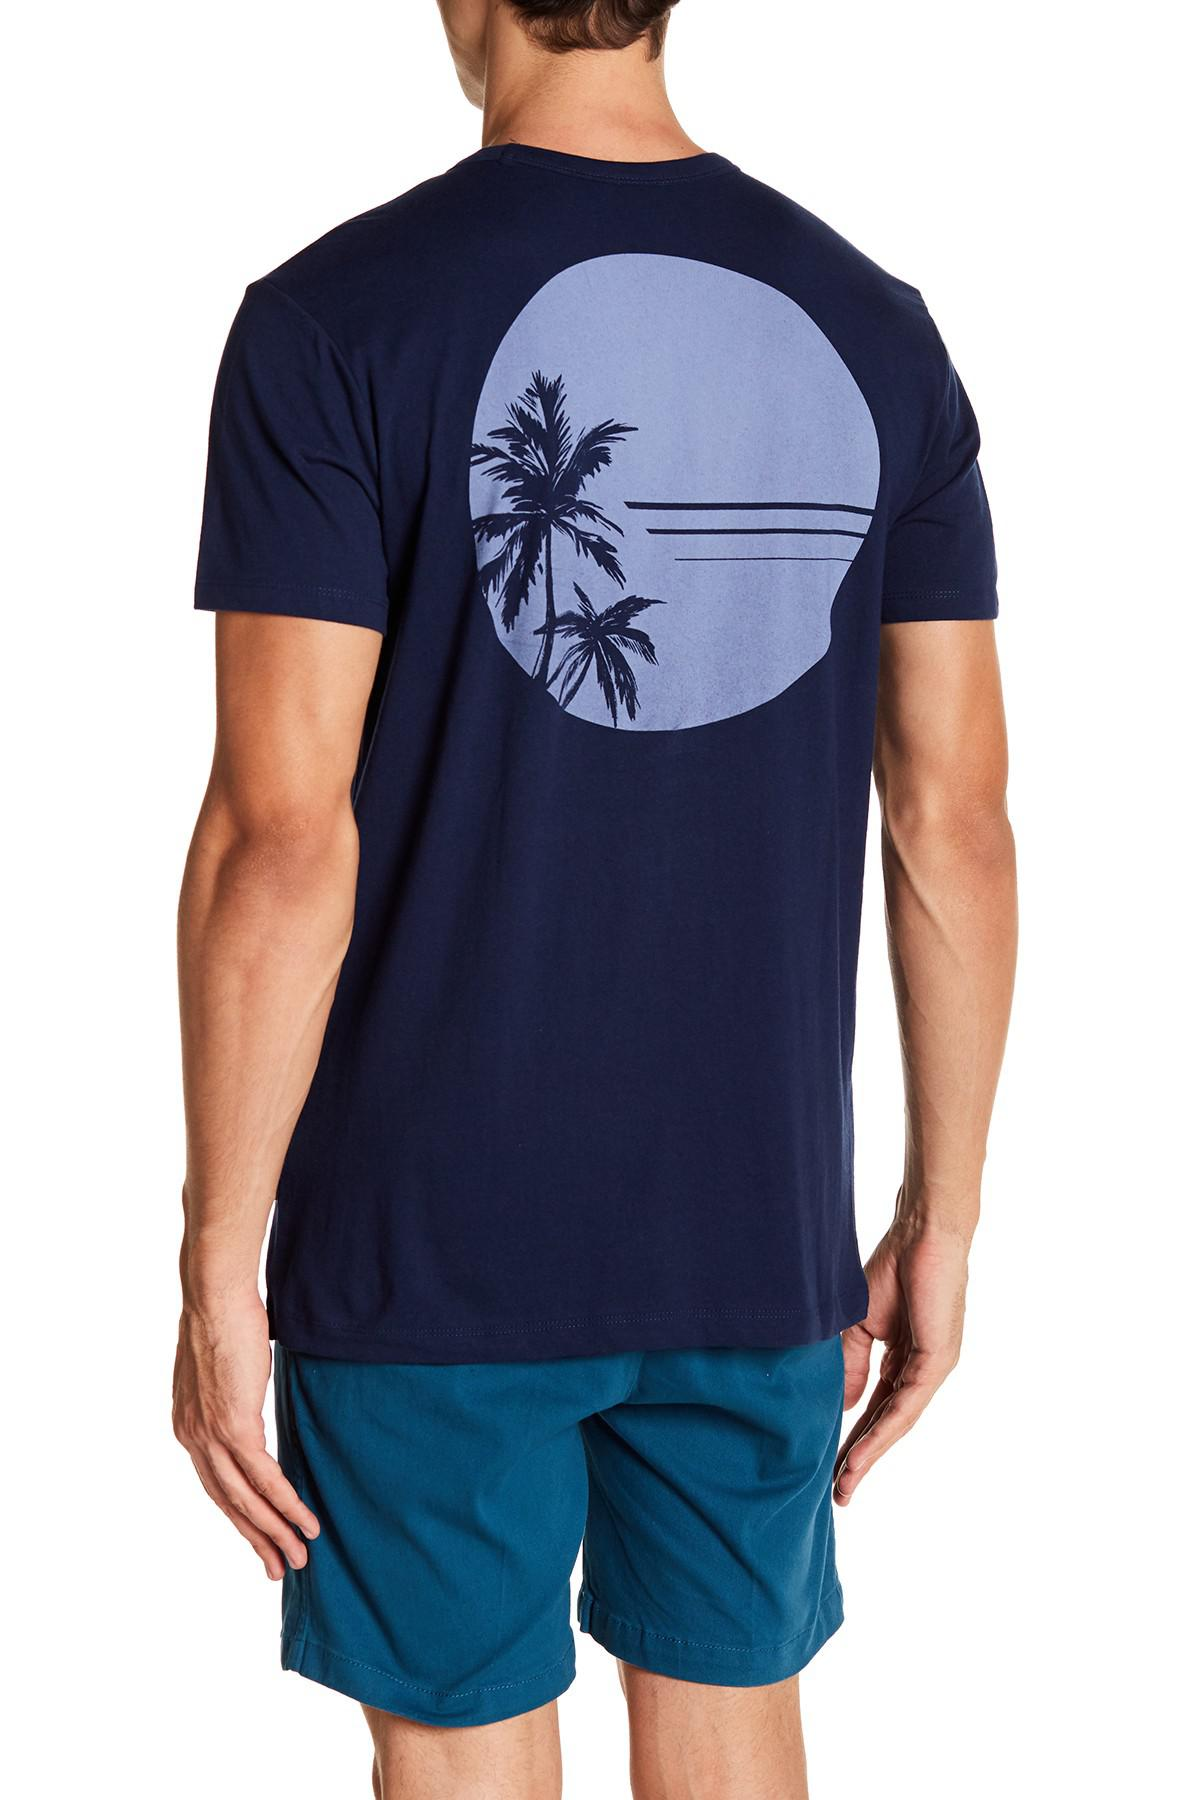 42df0cfe004 Johnny T Shirt In Examplary Deathwish Do It Johnny Blue Johnny T ...